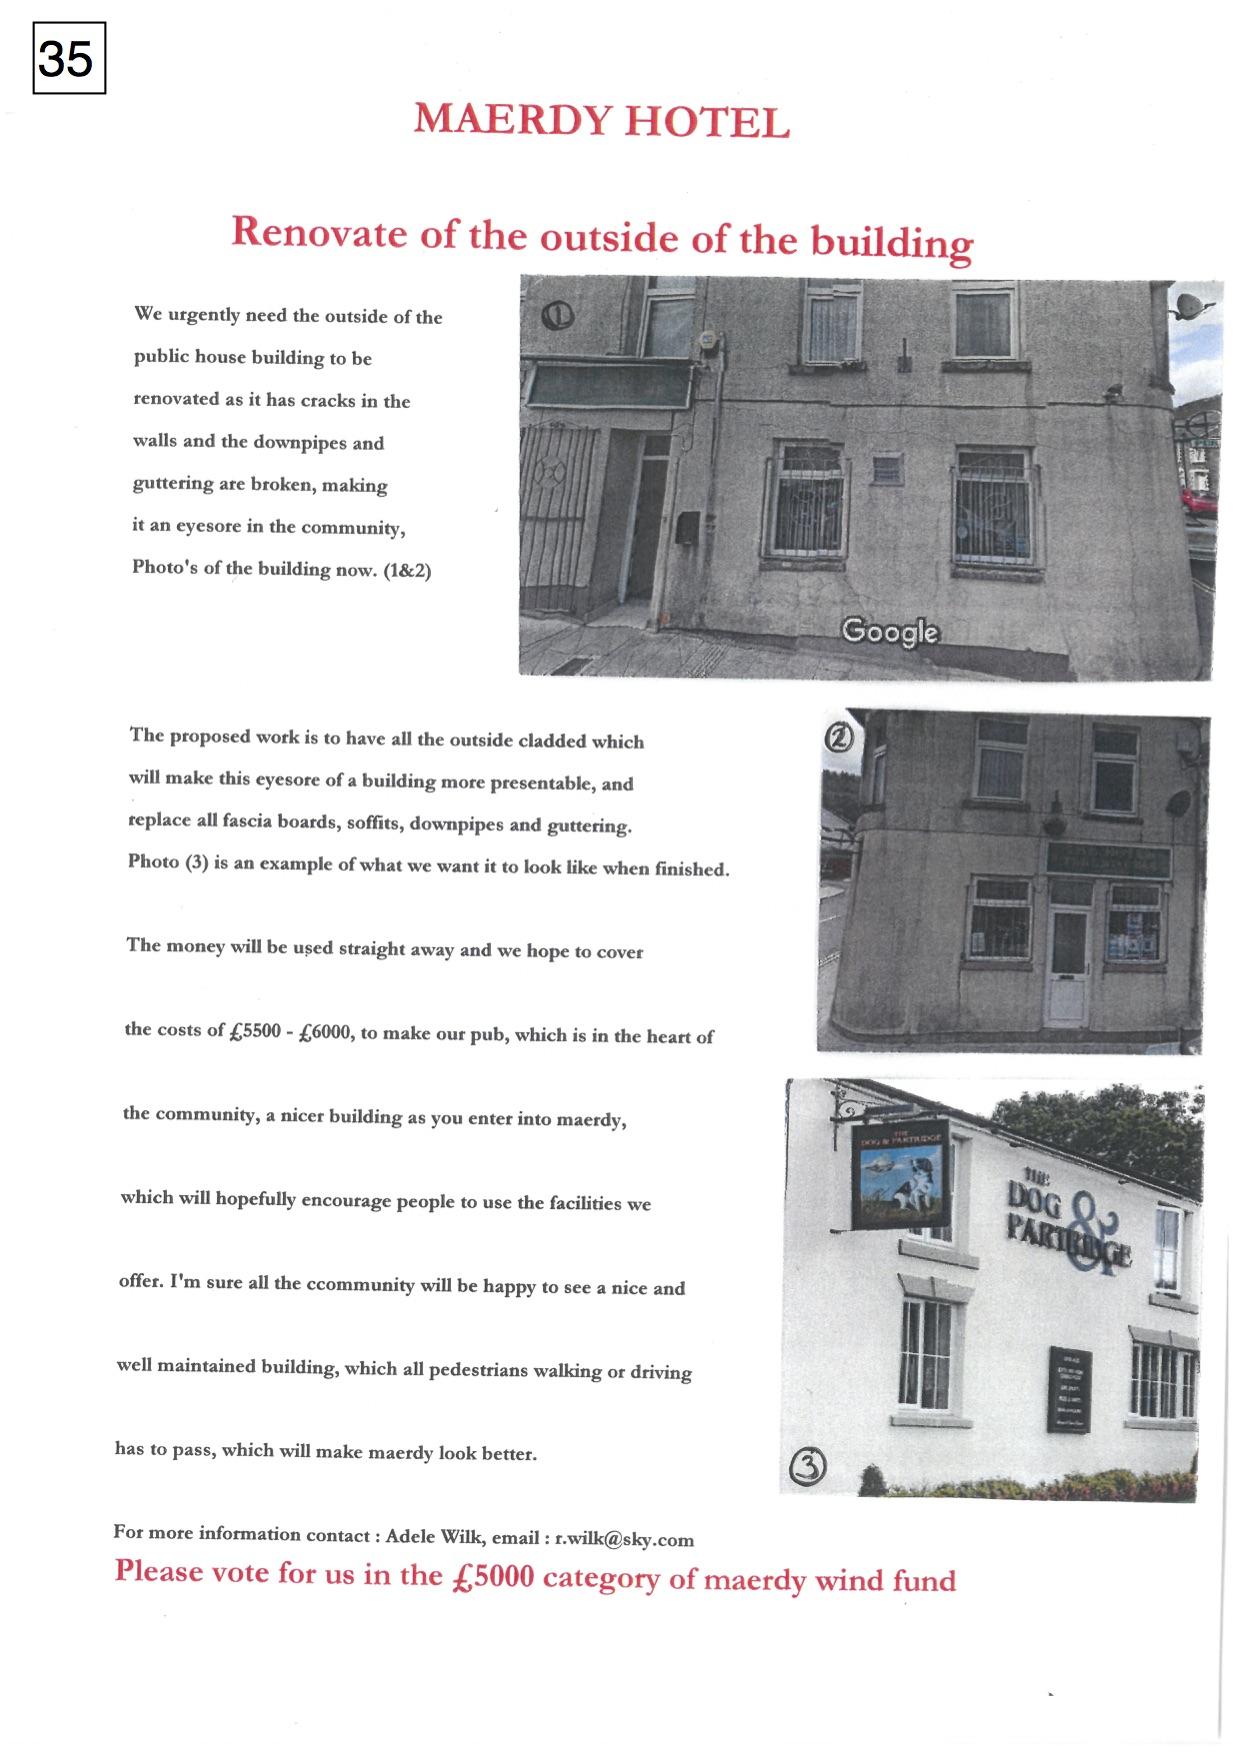 35. Maerdy Hotel - Poster - 221017